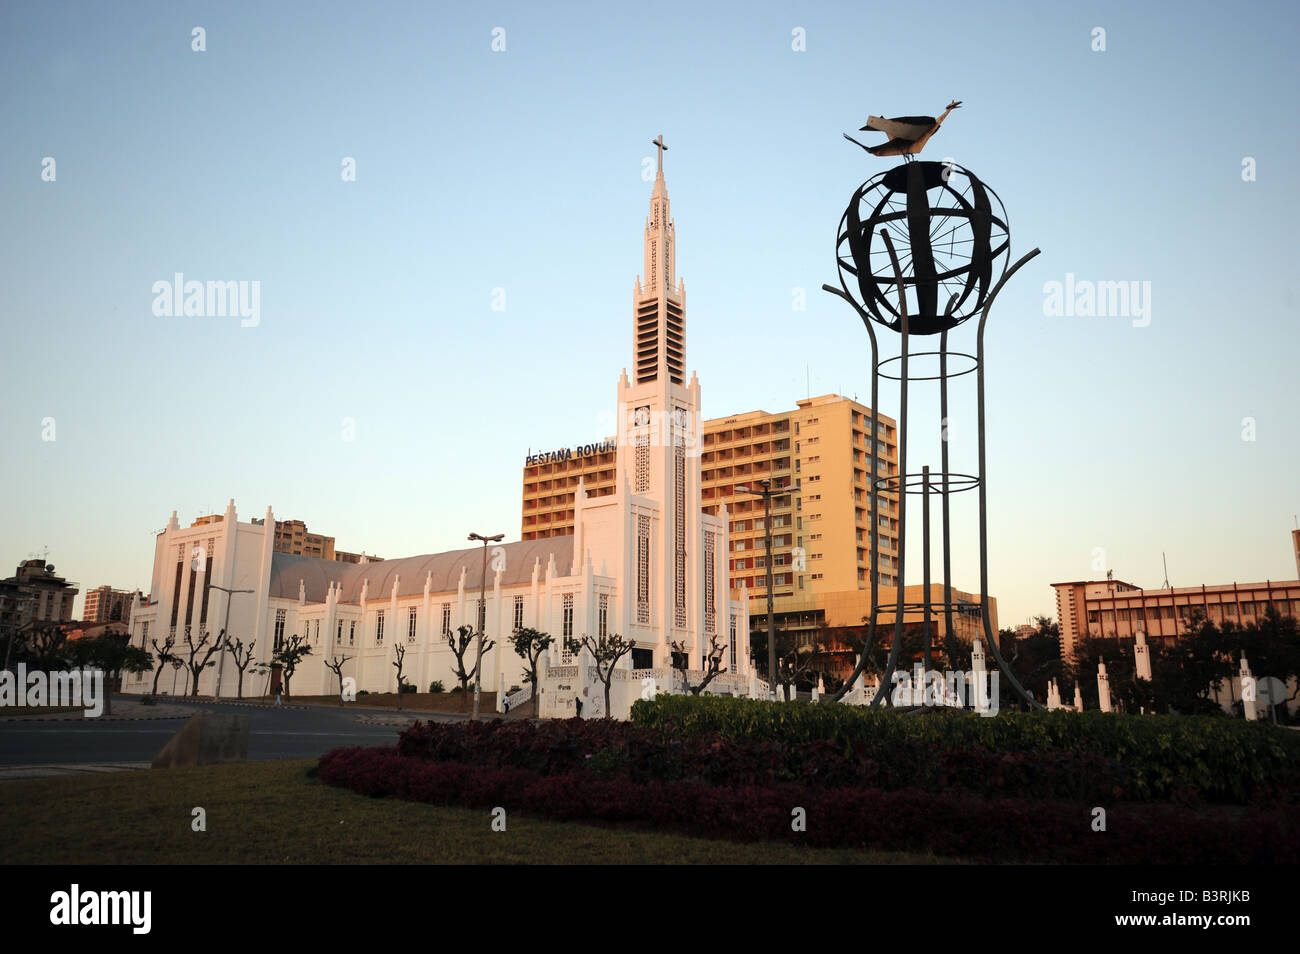 The Catholic cathedral of Nossa Senhora da Conceicao in Maputo, Mozambique. - Stock Image